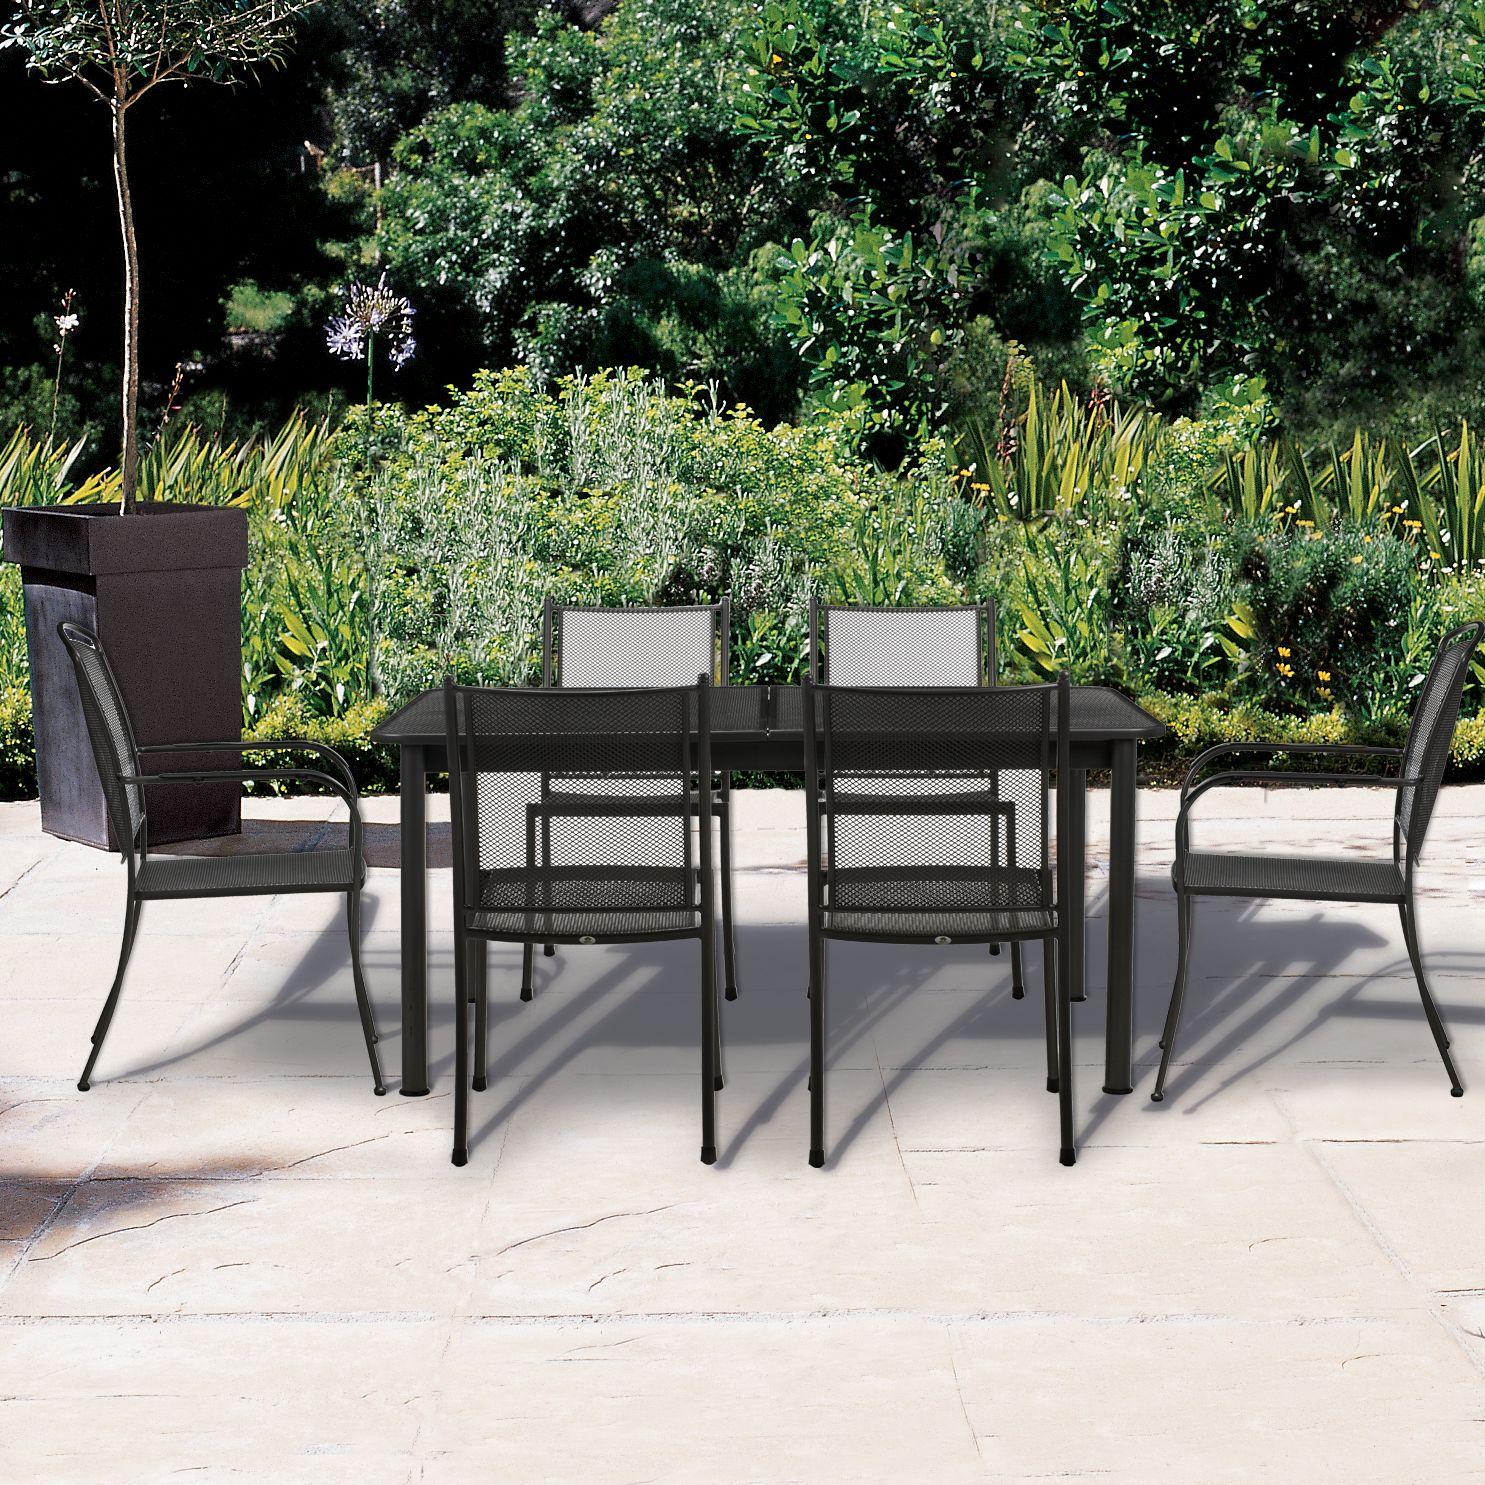 Royal Garden Classic Furniture Range